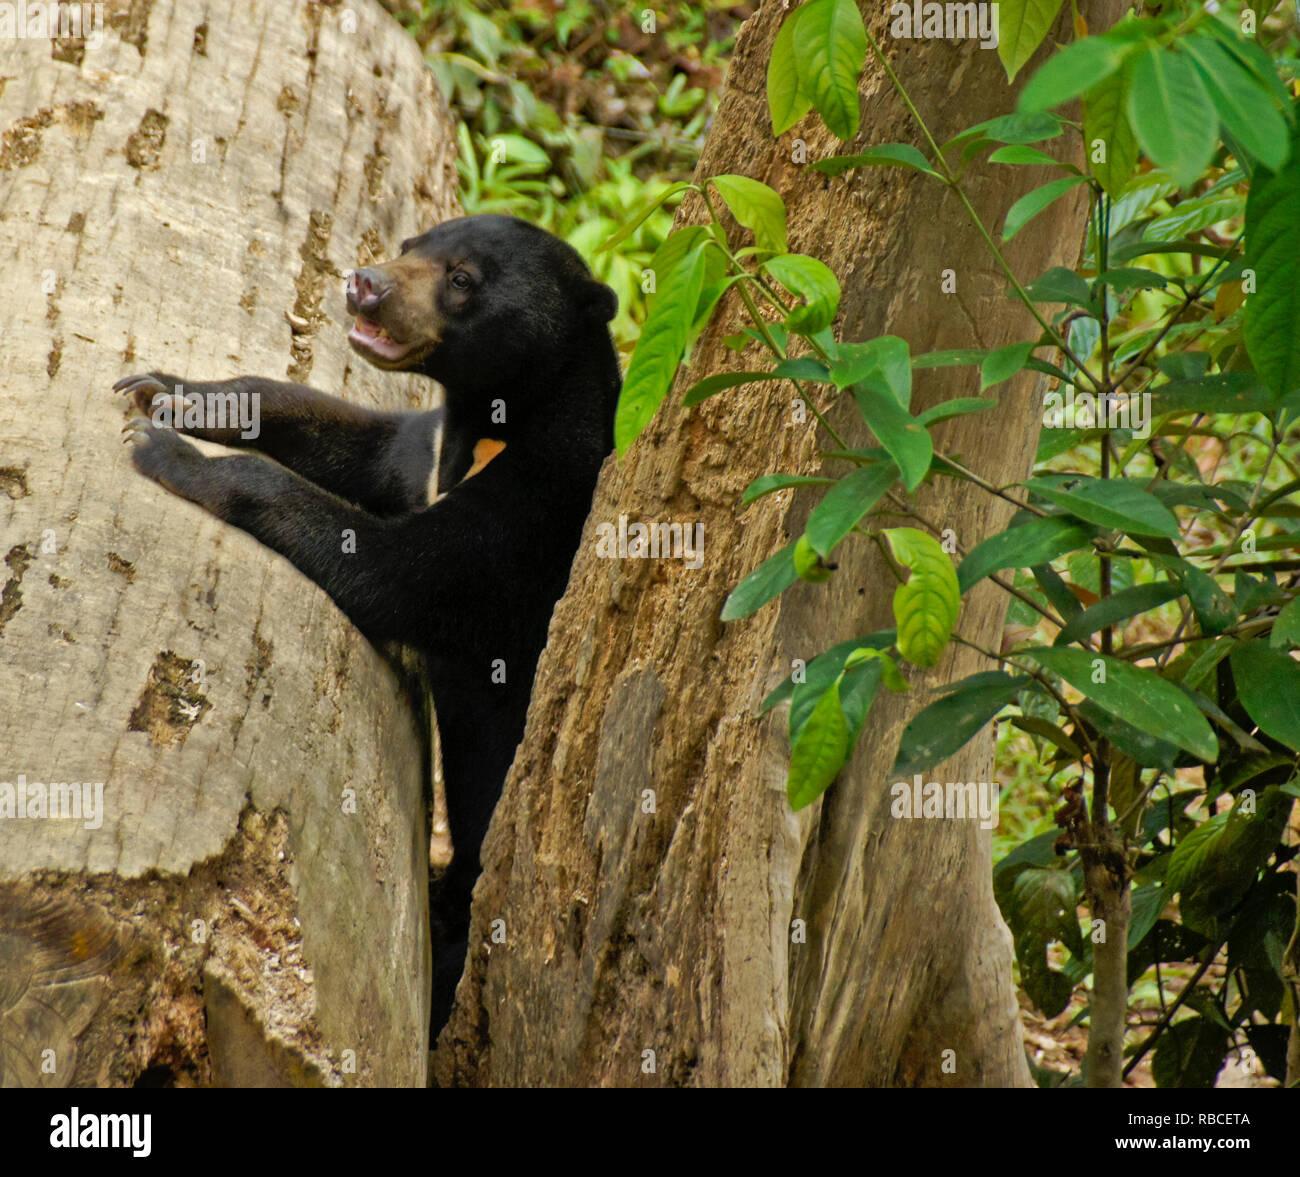 Malayan sun bear climbing on tree at Bornean Sun Bear Conservation Centre, Sandakan, Sabah (Borneo), Malaysia - Stock Image